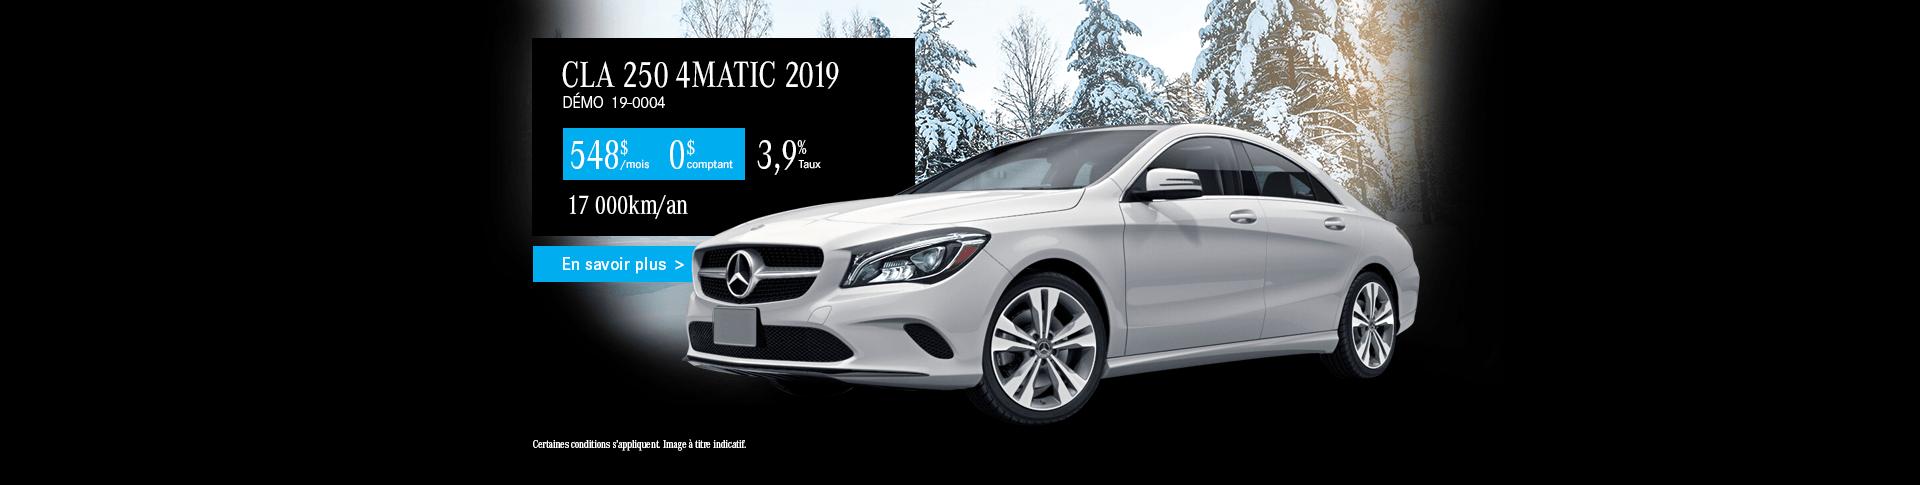 Mercedes-Benz CLA250 2019